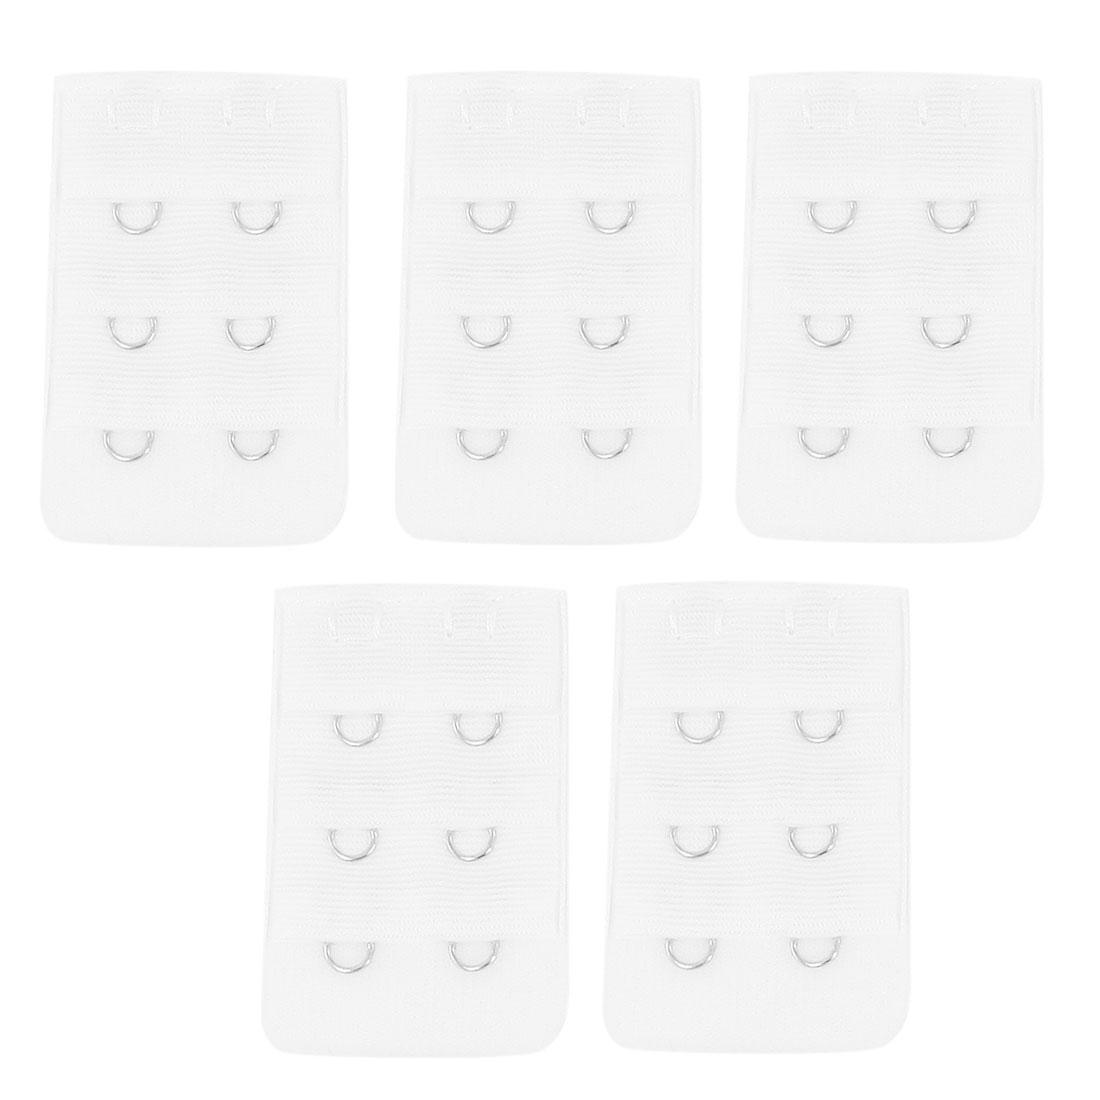 5 Pcs Women 3 Row Hook and Eye Tape Extension Bra Strap Extender White